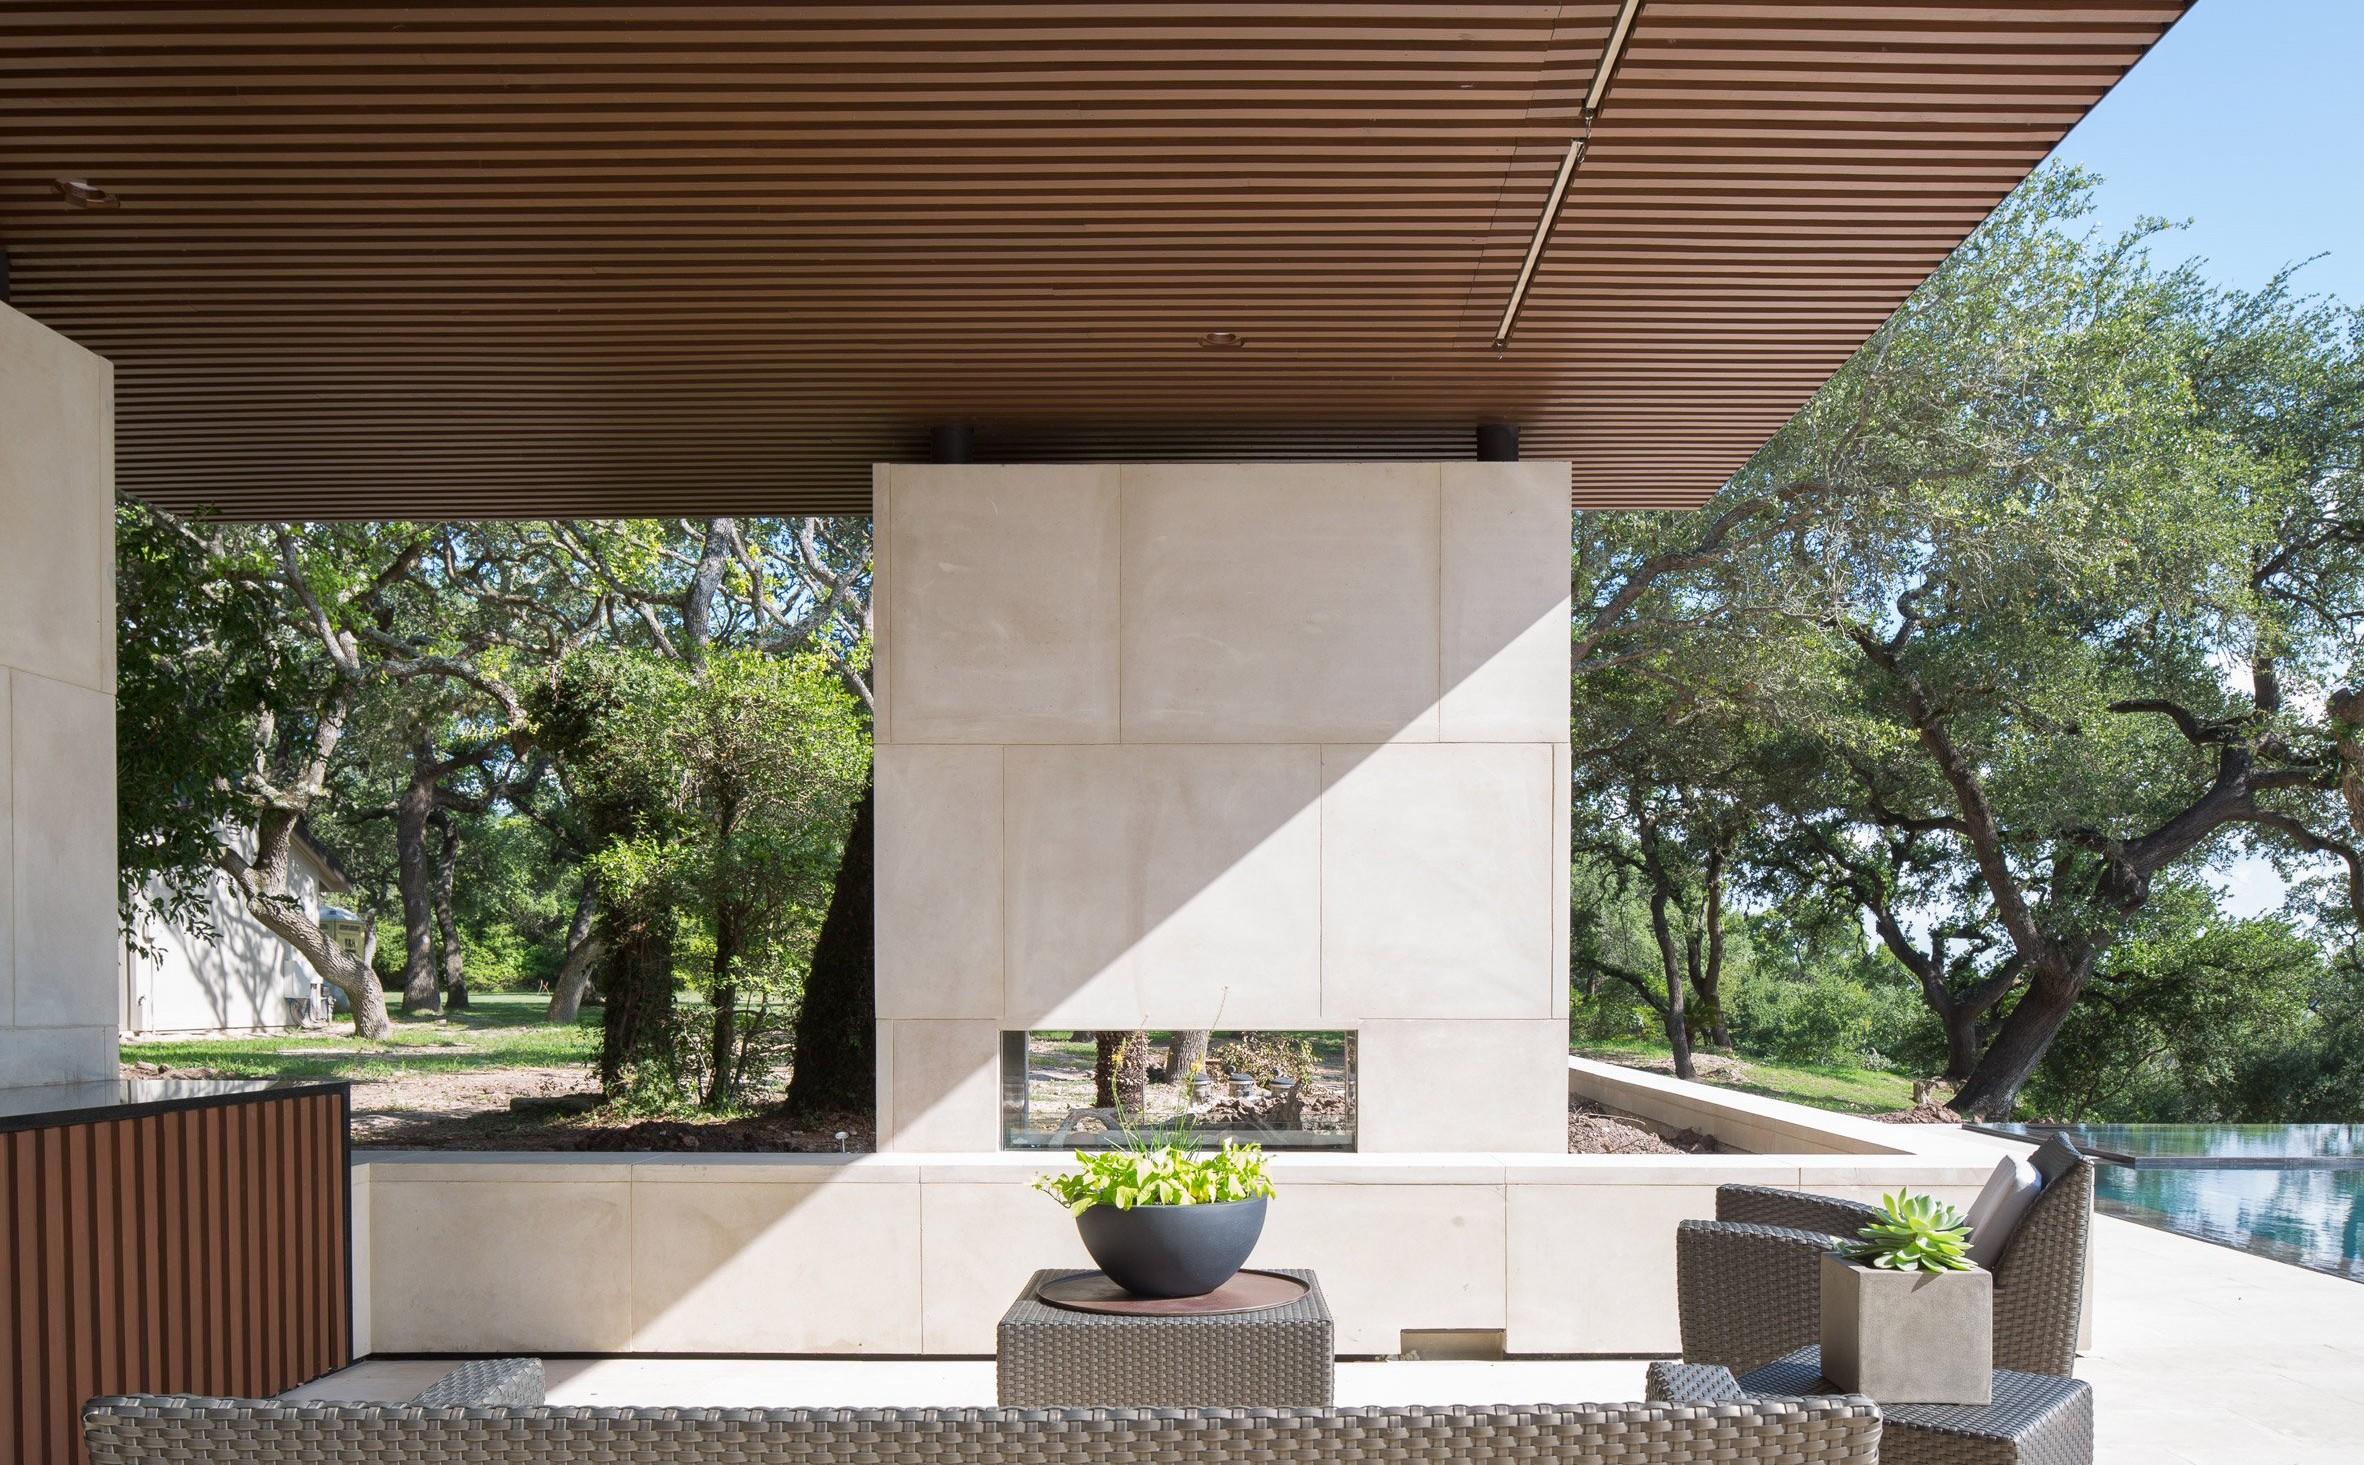 la-grange-pavilion-murray-legge-architecture-leonid-furmansky_dezeen_2364_col_9